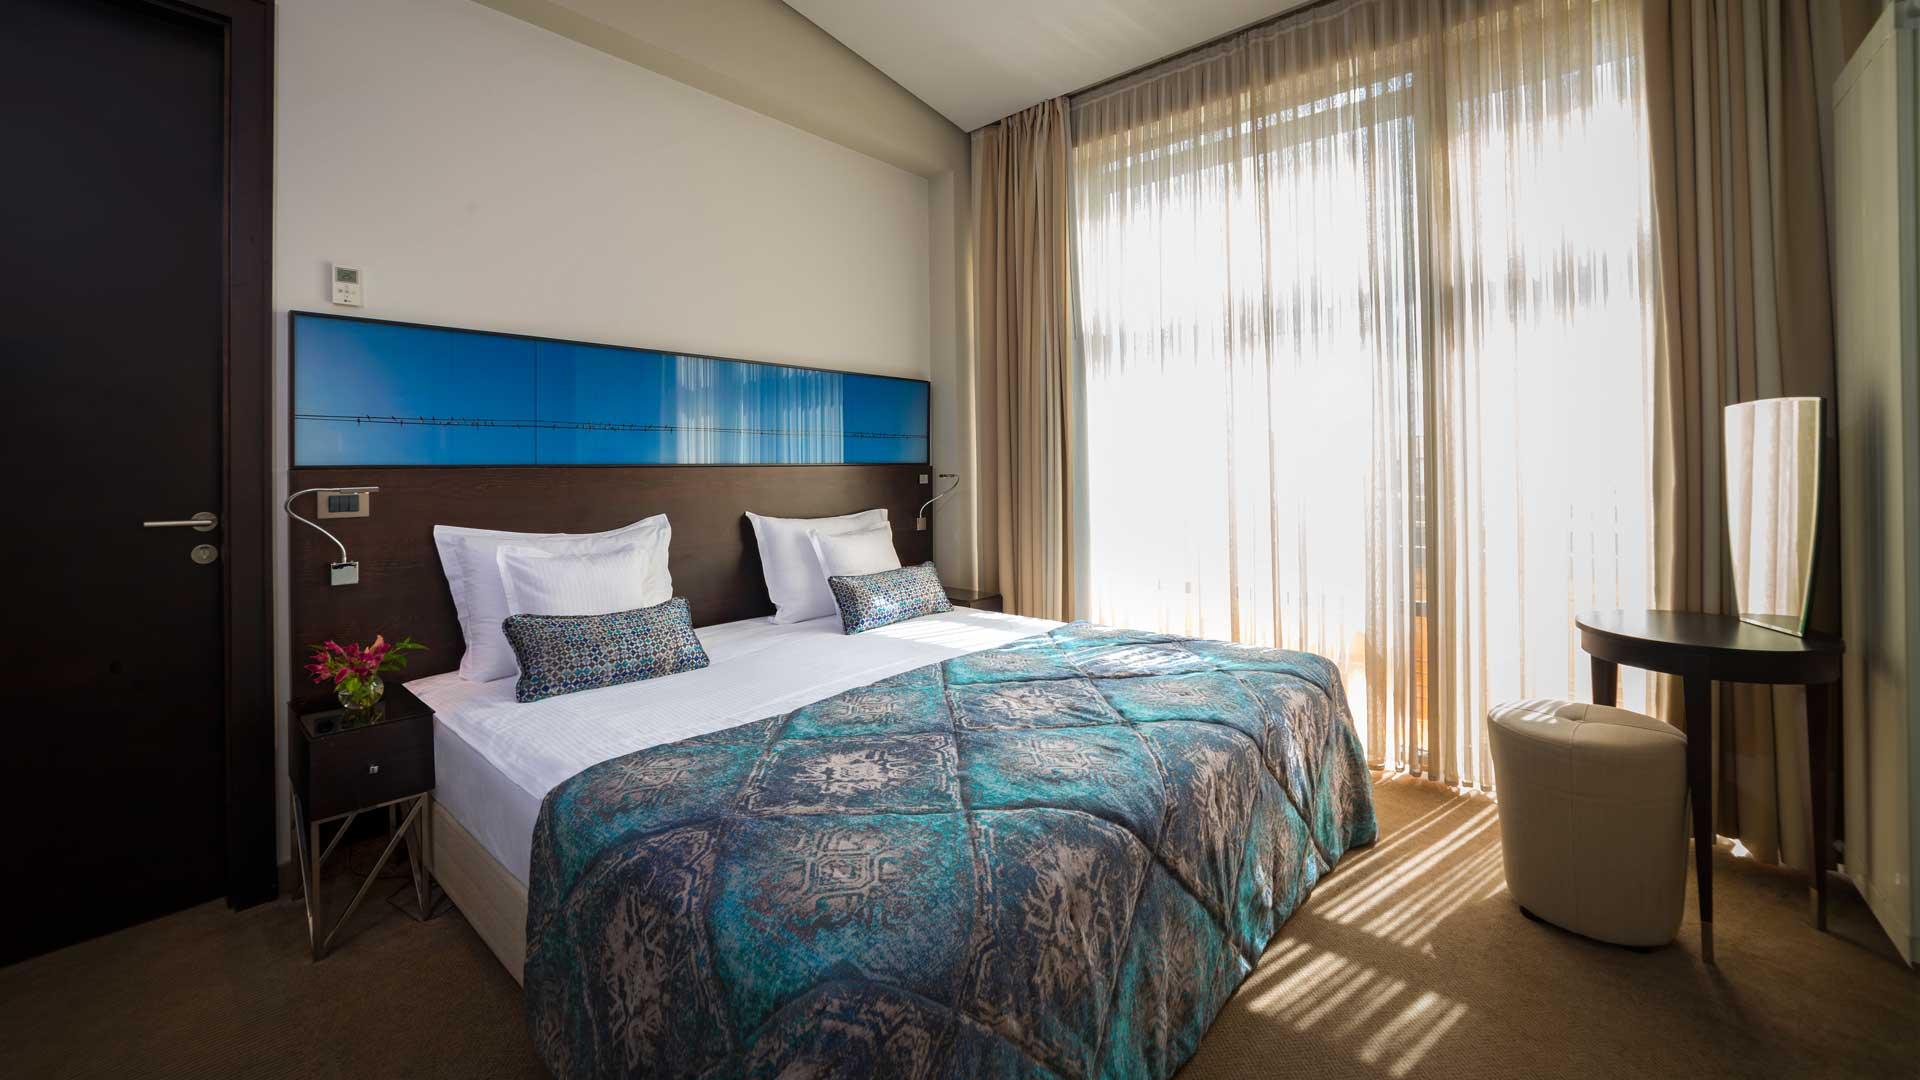 Townhouse27 suite